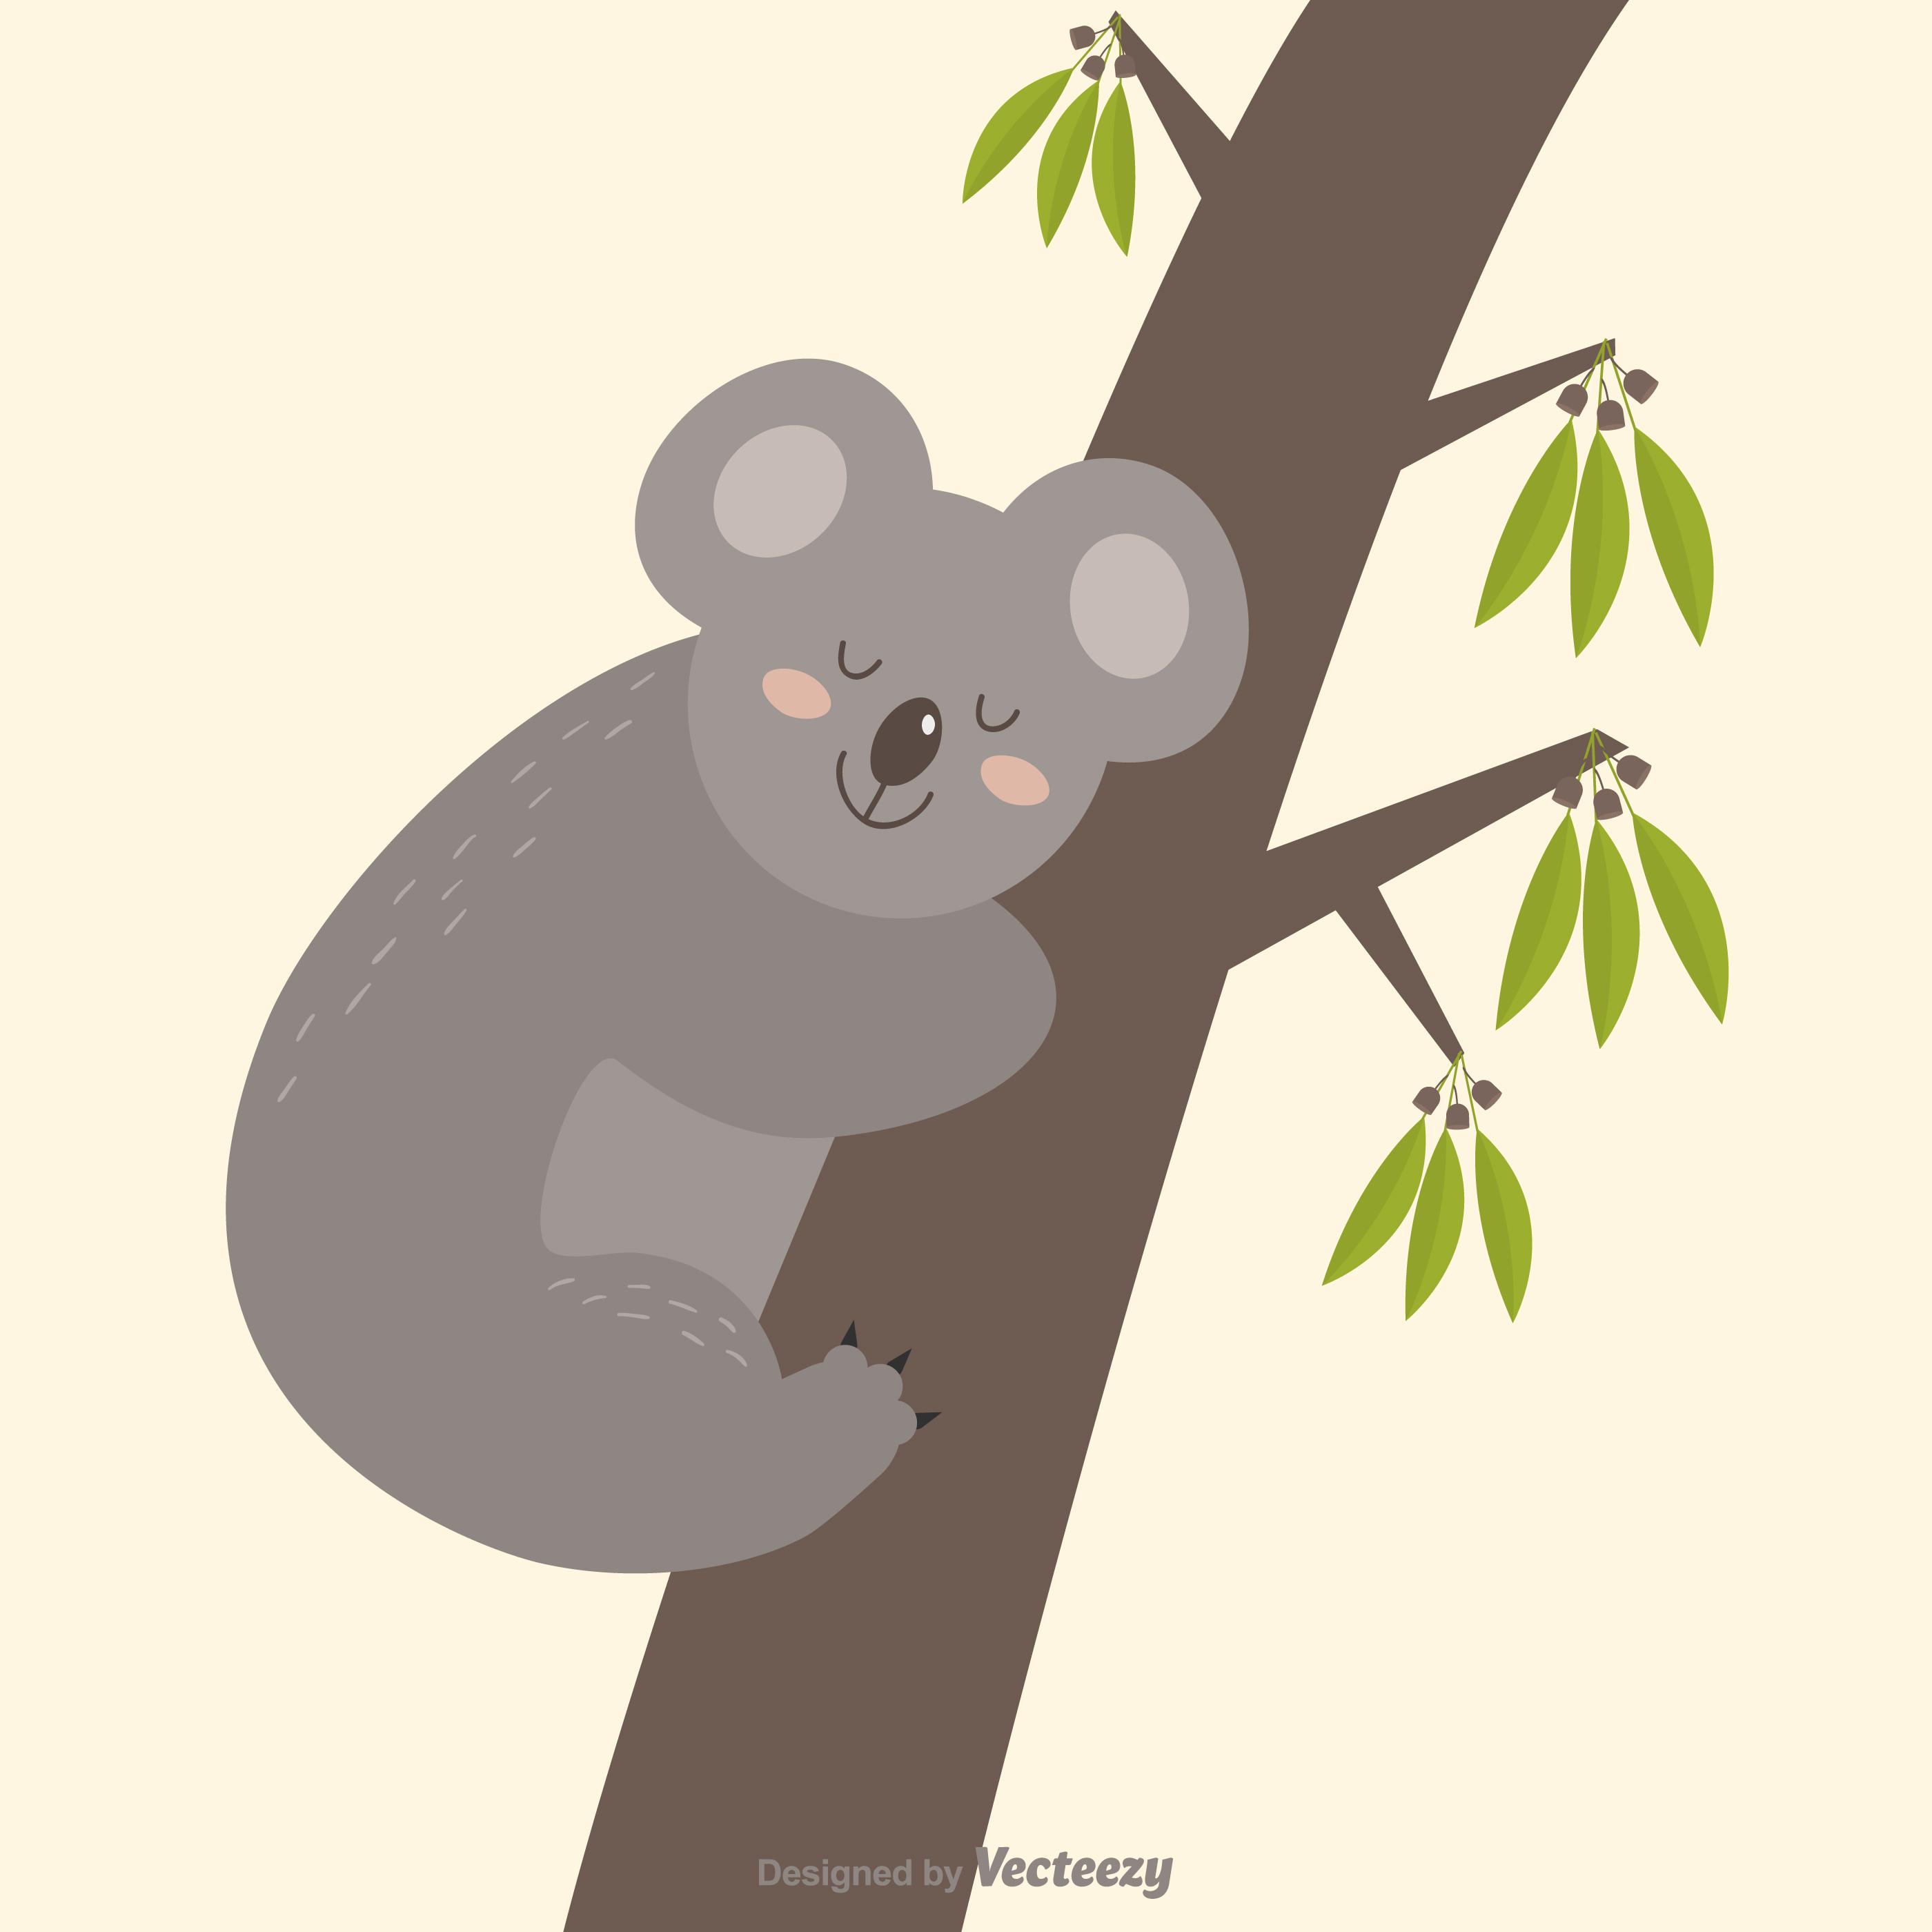 Lindo koala australiano durmiendo en un vector de árbol de goma ...